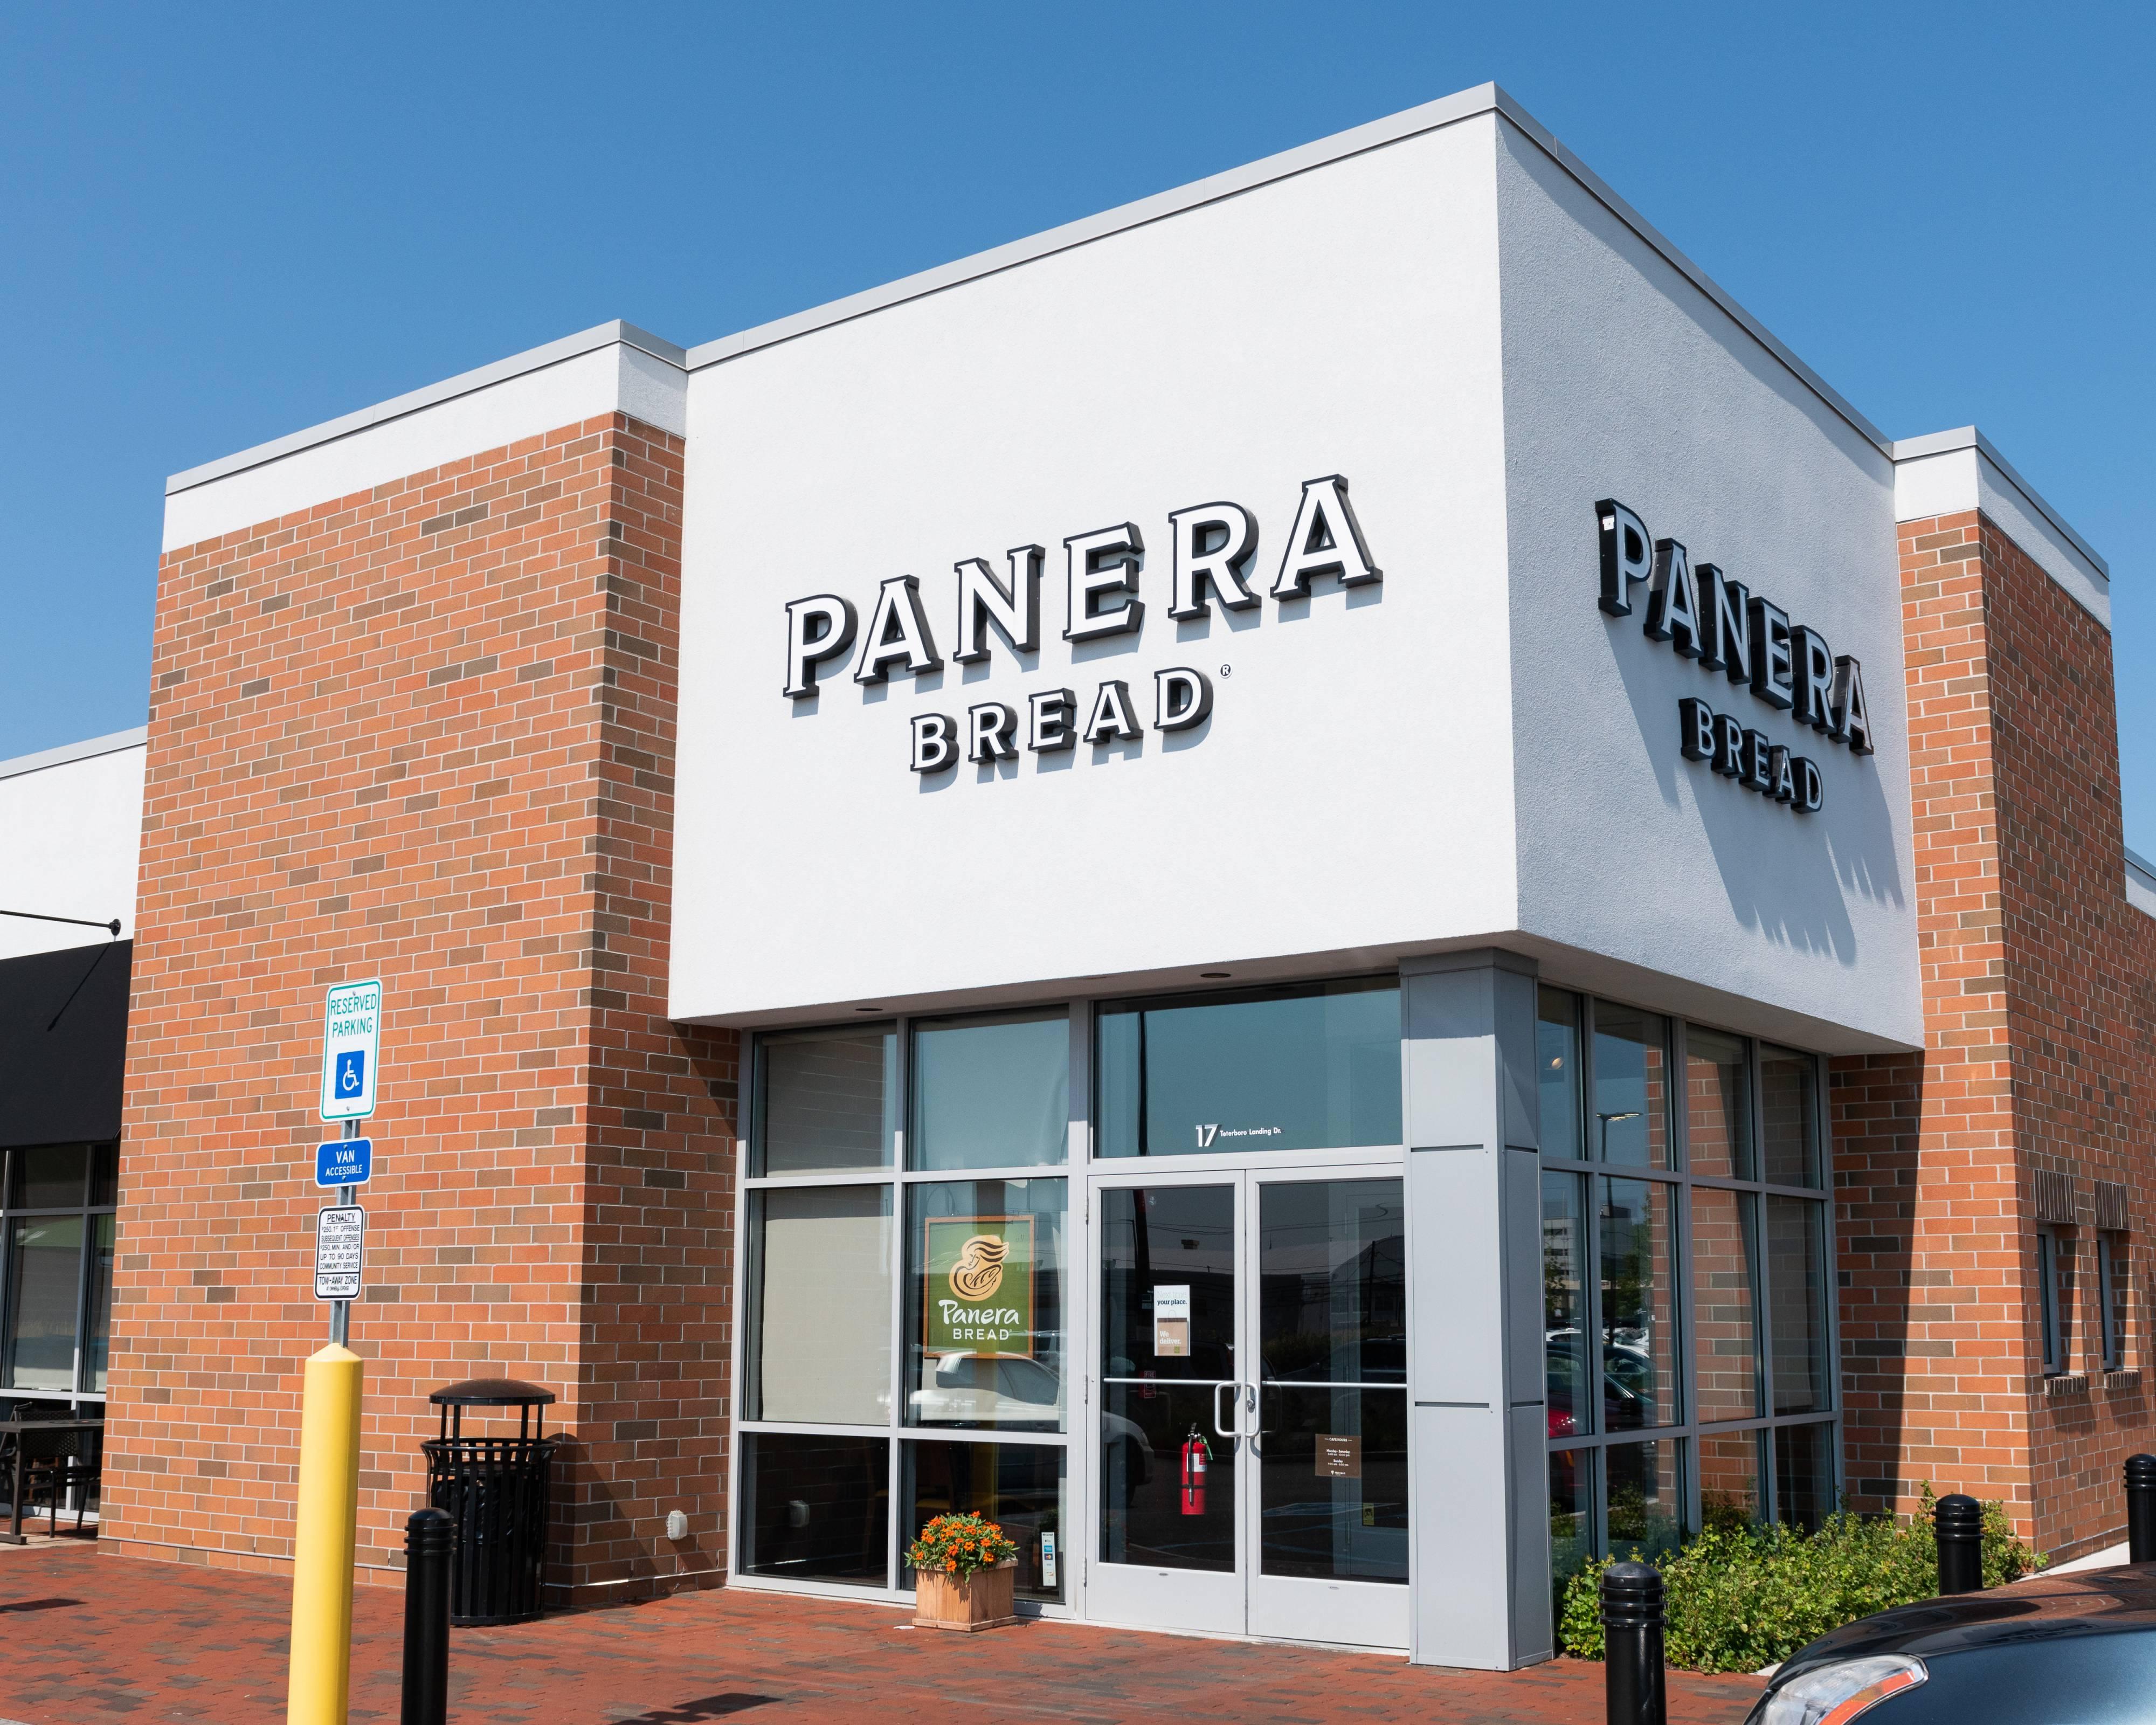 Panera Bread store in Teterboro, N.J.